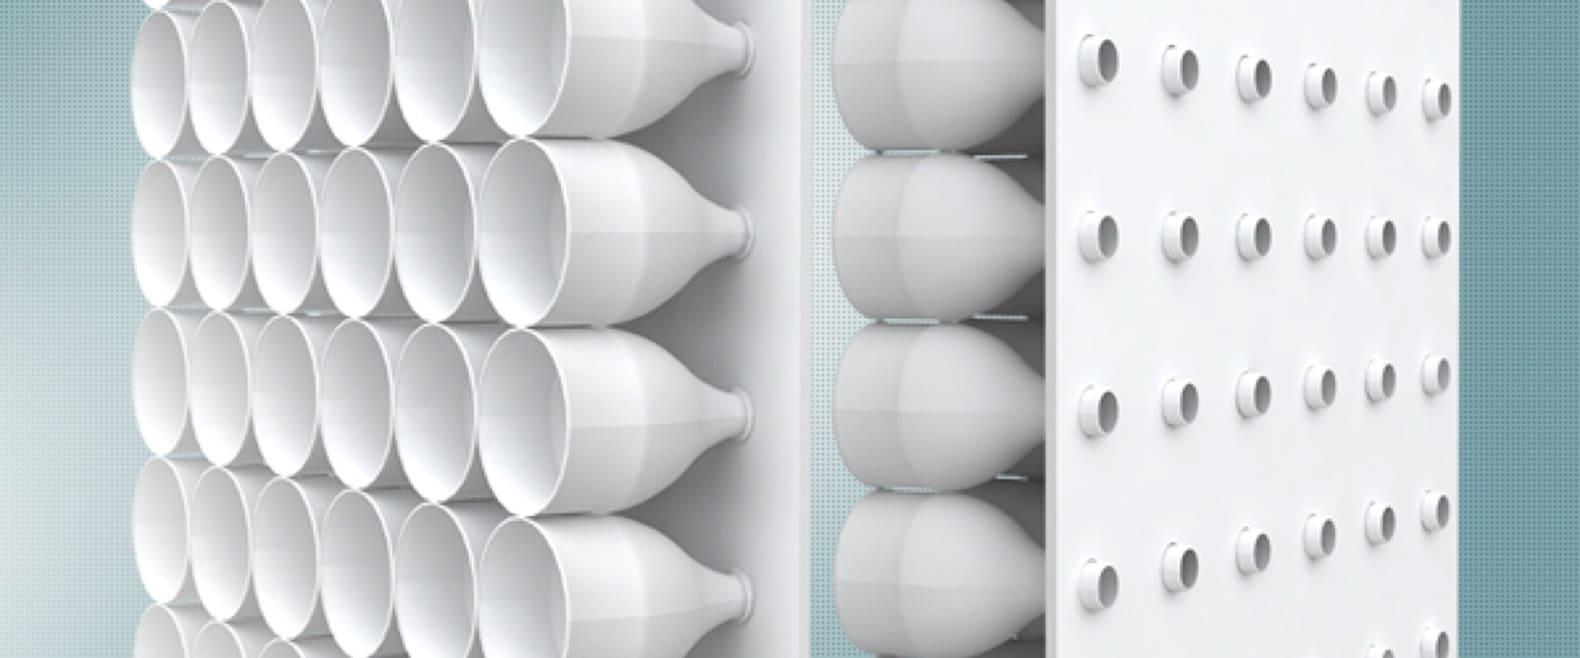 Eco-Cooler-Plastic-Bottle-Air-Conditioner-1580x658